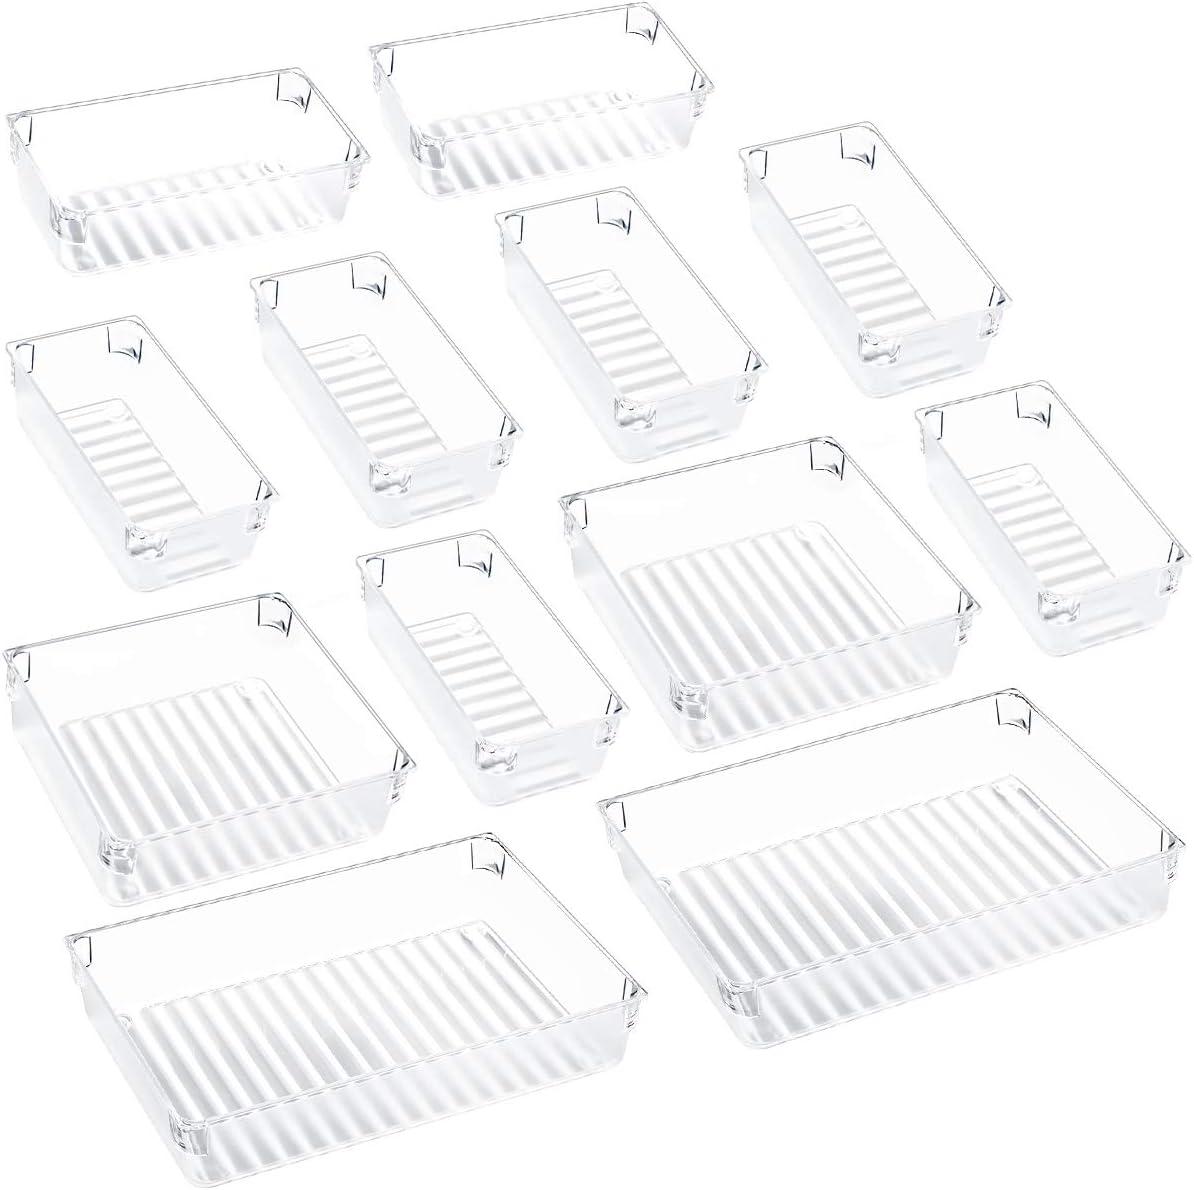 Kootek Desk Drawer Organizer Trays with 3-Size Drawer Dividers 12 Organizers Bins Customize Layout Storage Box for Bedroom Dresser Bathroom Kitchen Office (2 Sets)